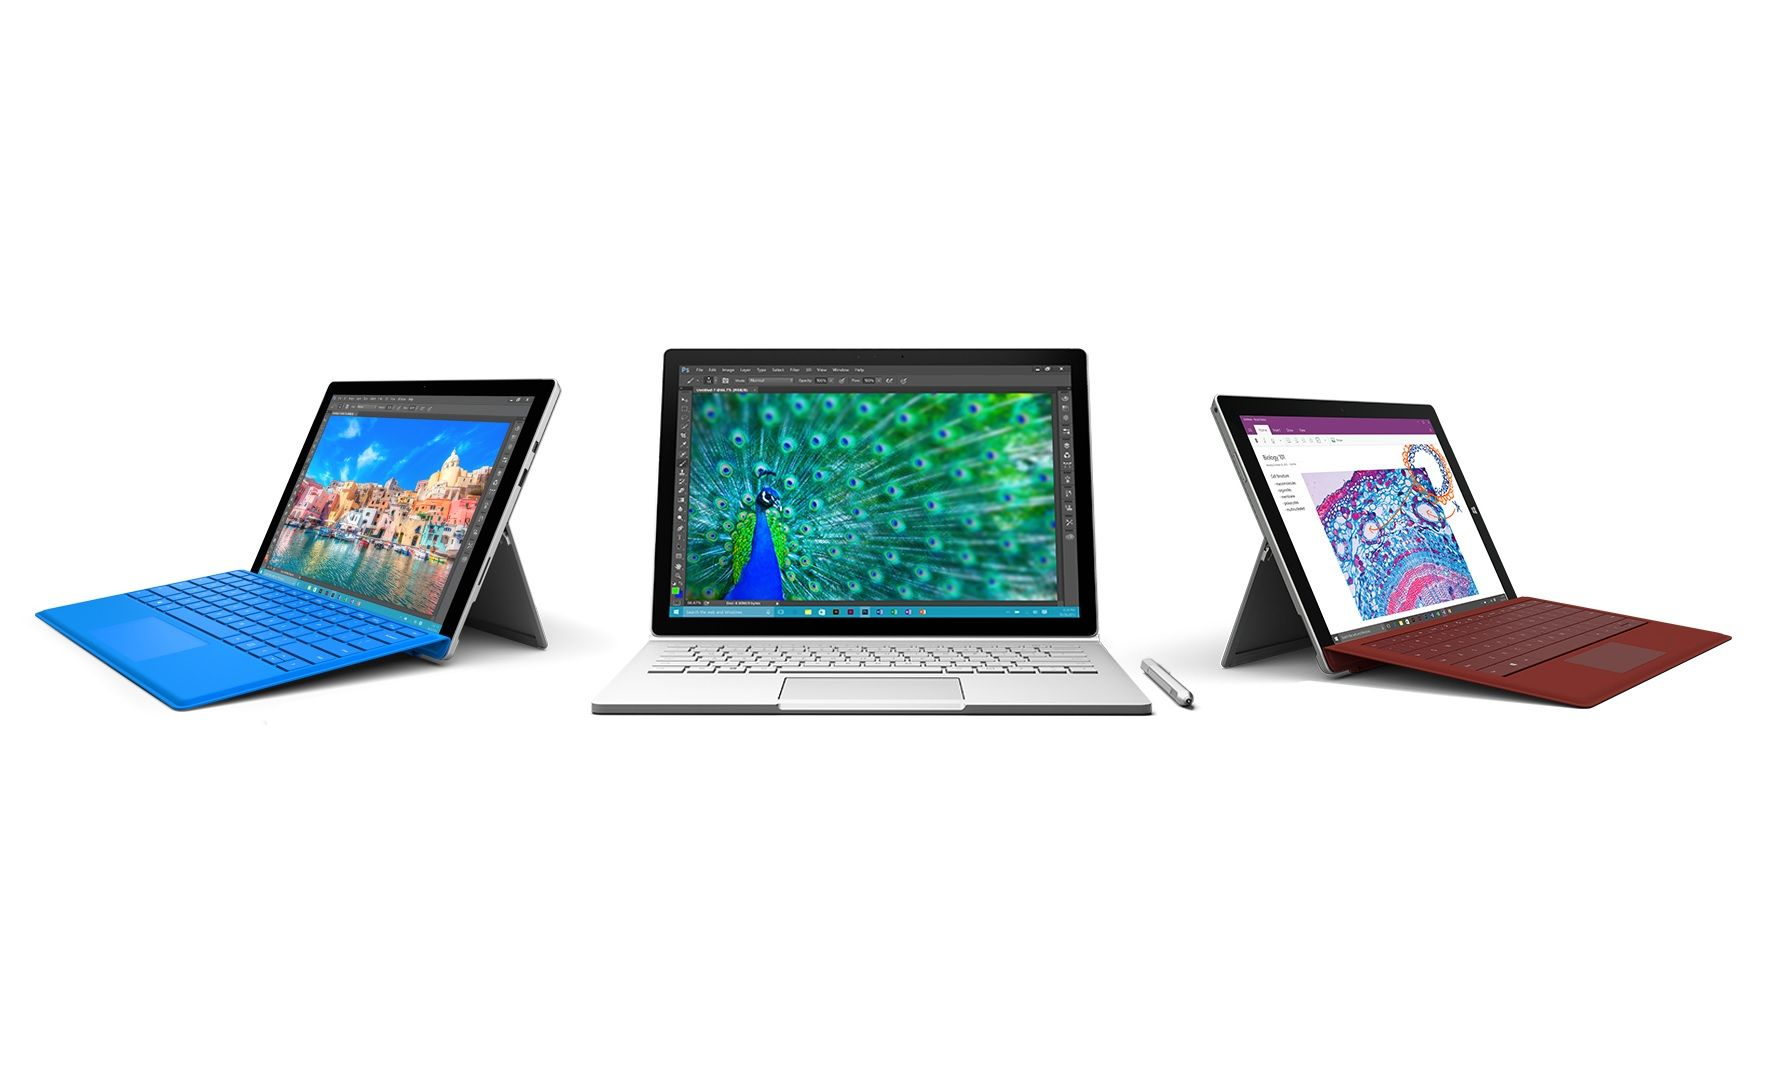 Cyber Monday deals: Surface Pro 4, Pro 3, Book